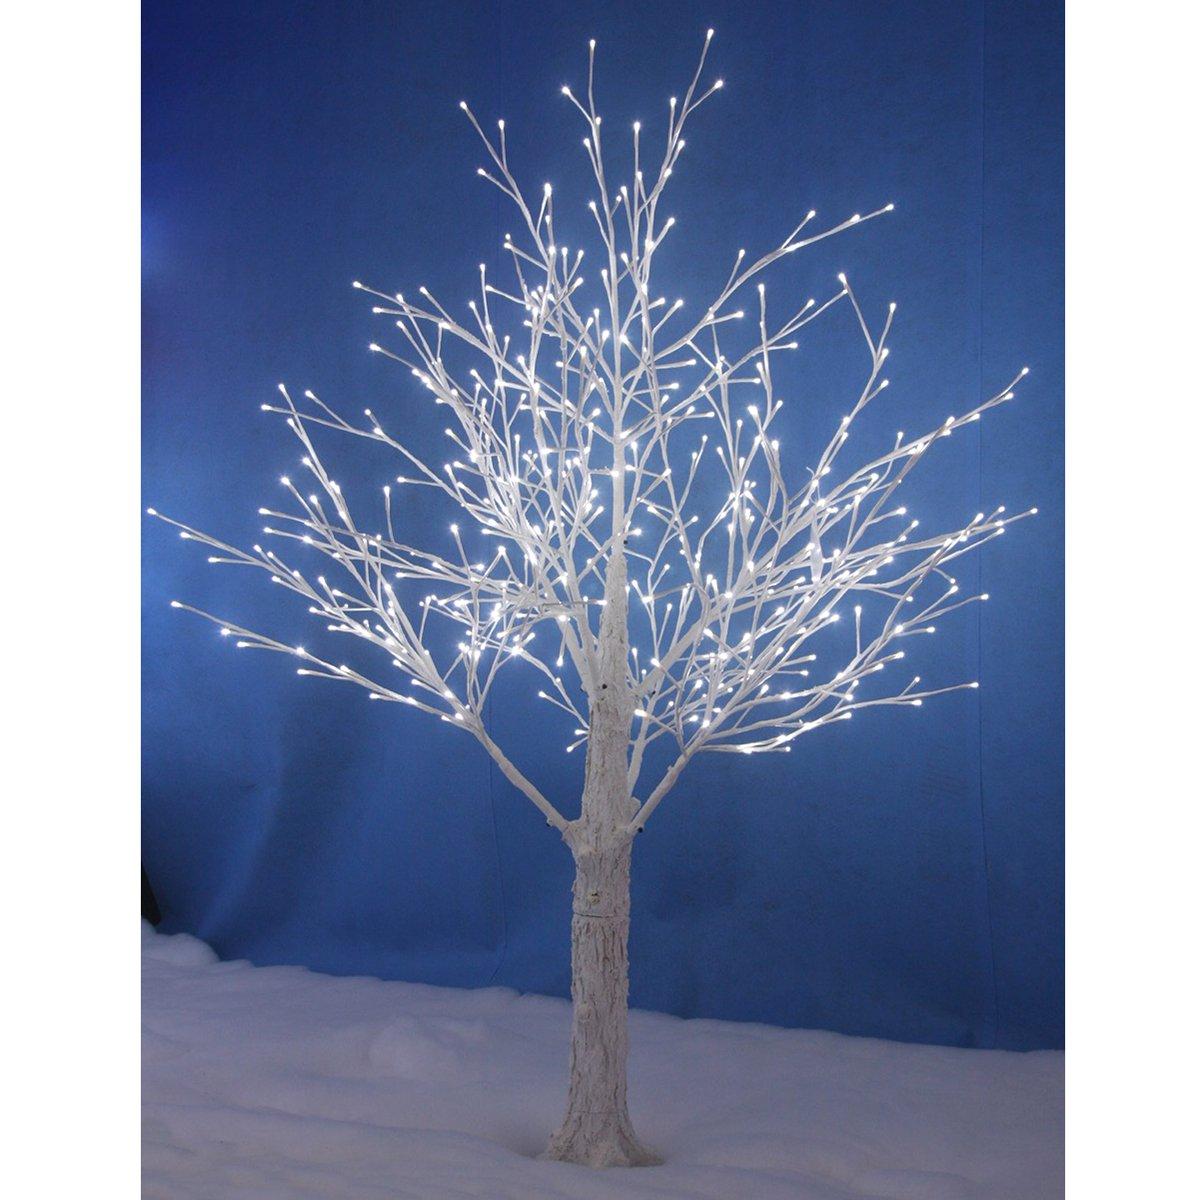 SPARKLES 150cm White Snowy Twig Tree 448 White LED Lights Xmas Indoor  Outdoor Decoration: Amazon.co.uk: Kitchen U0026 Home